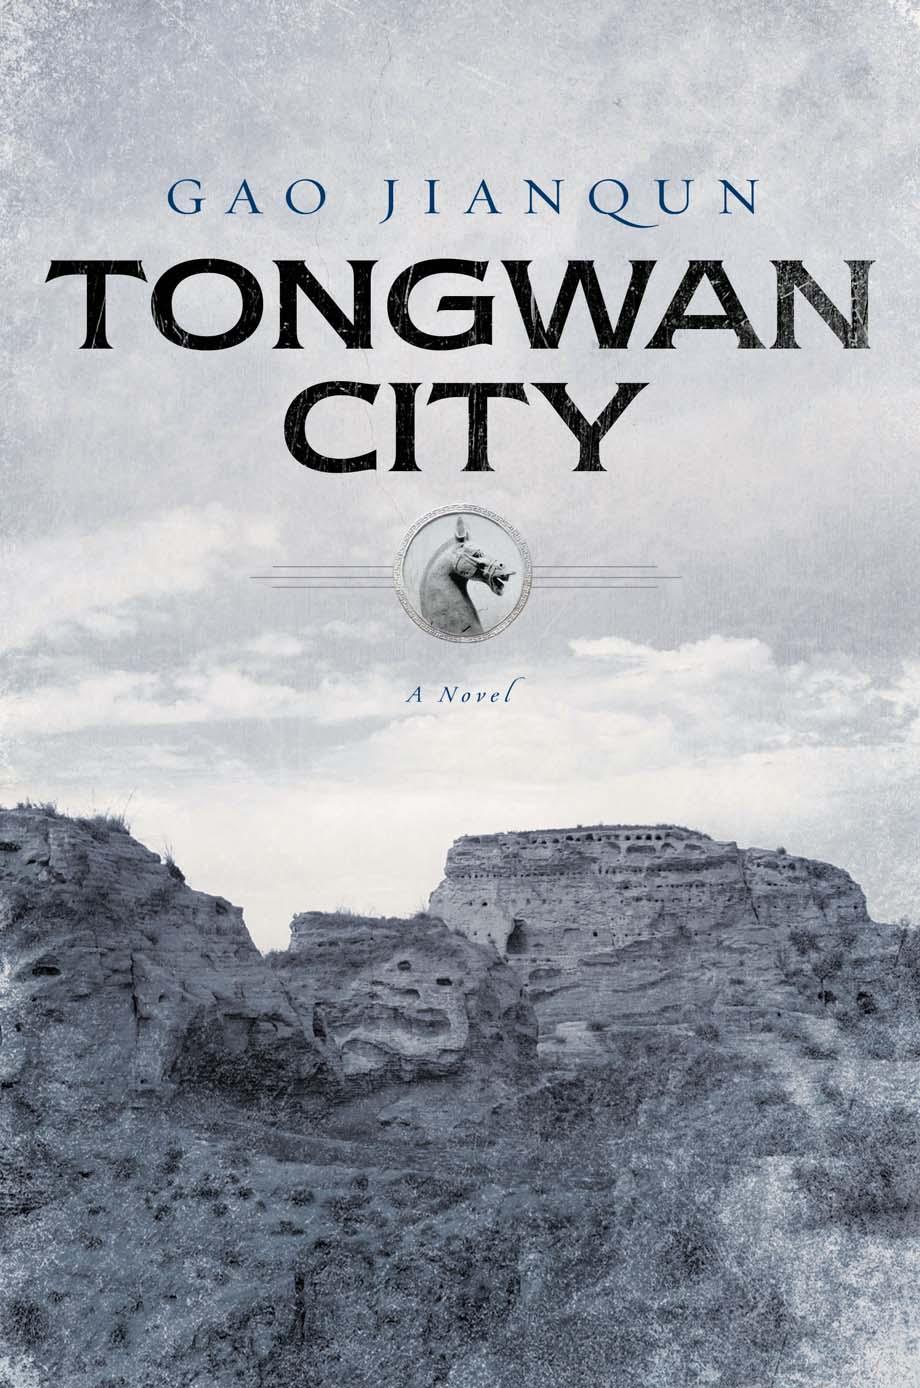 TongwanCity-horse11.jpg